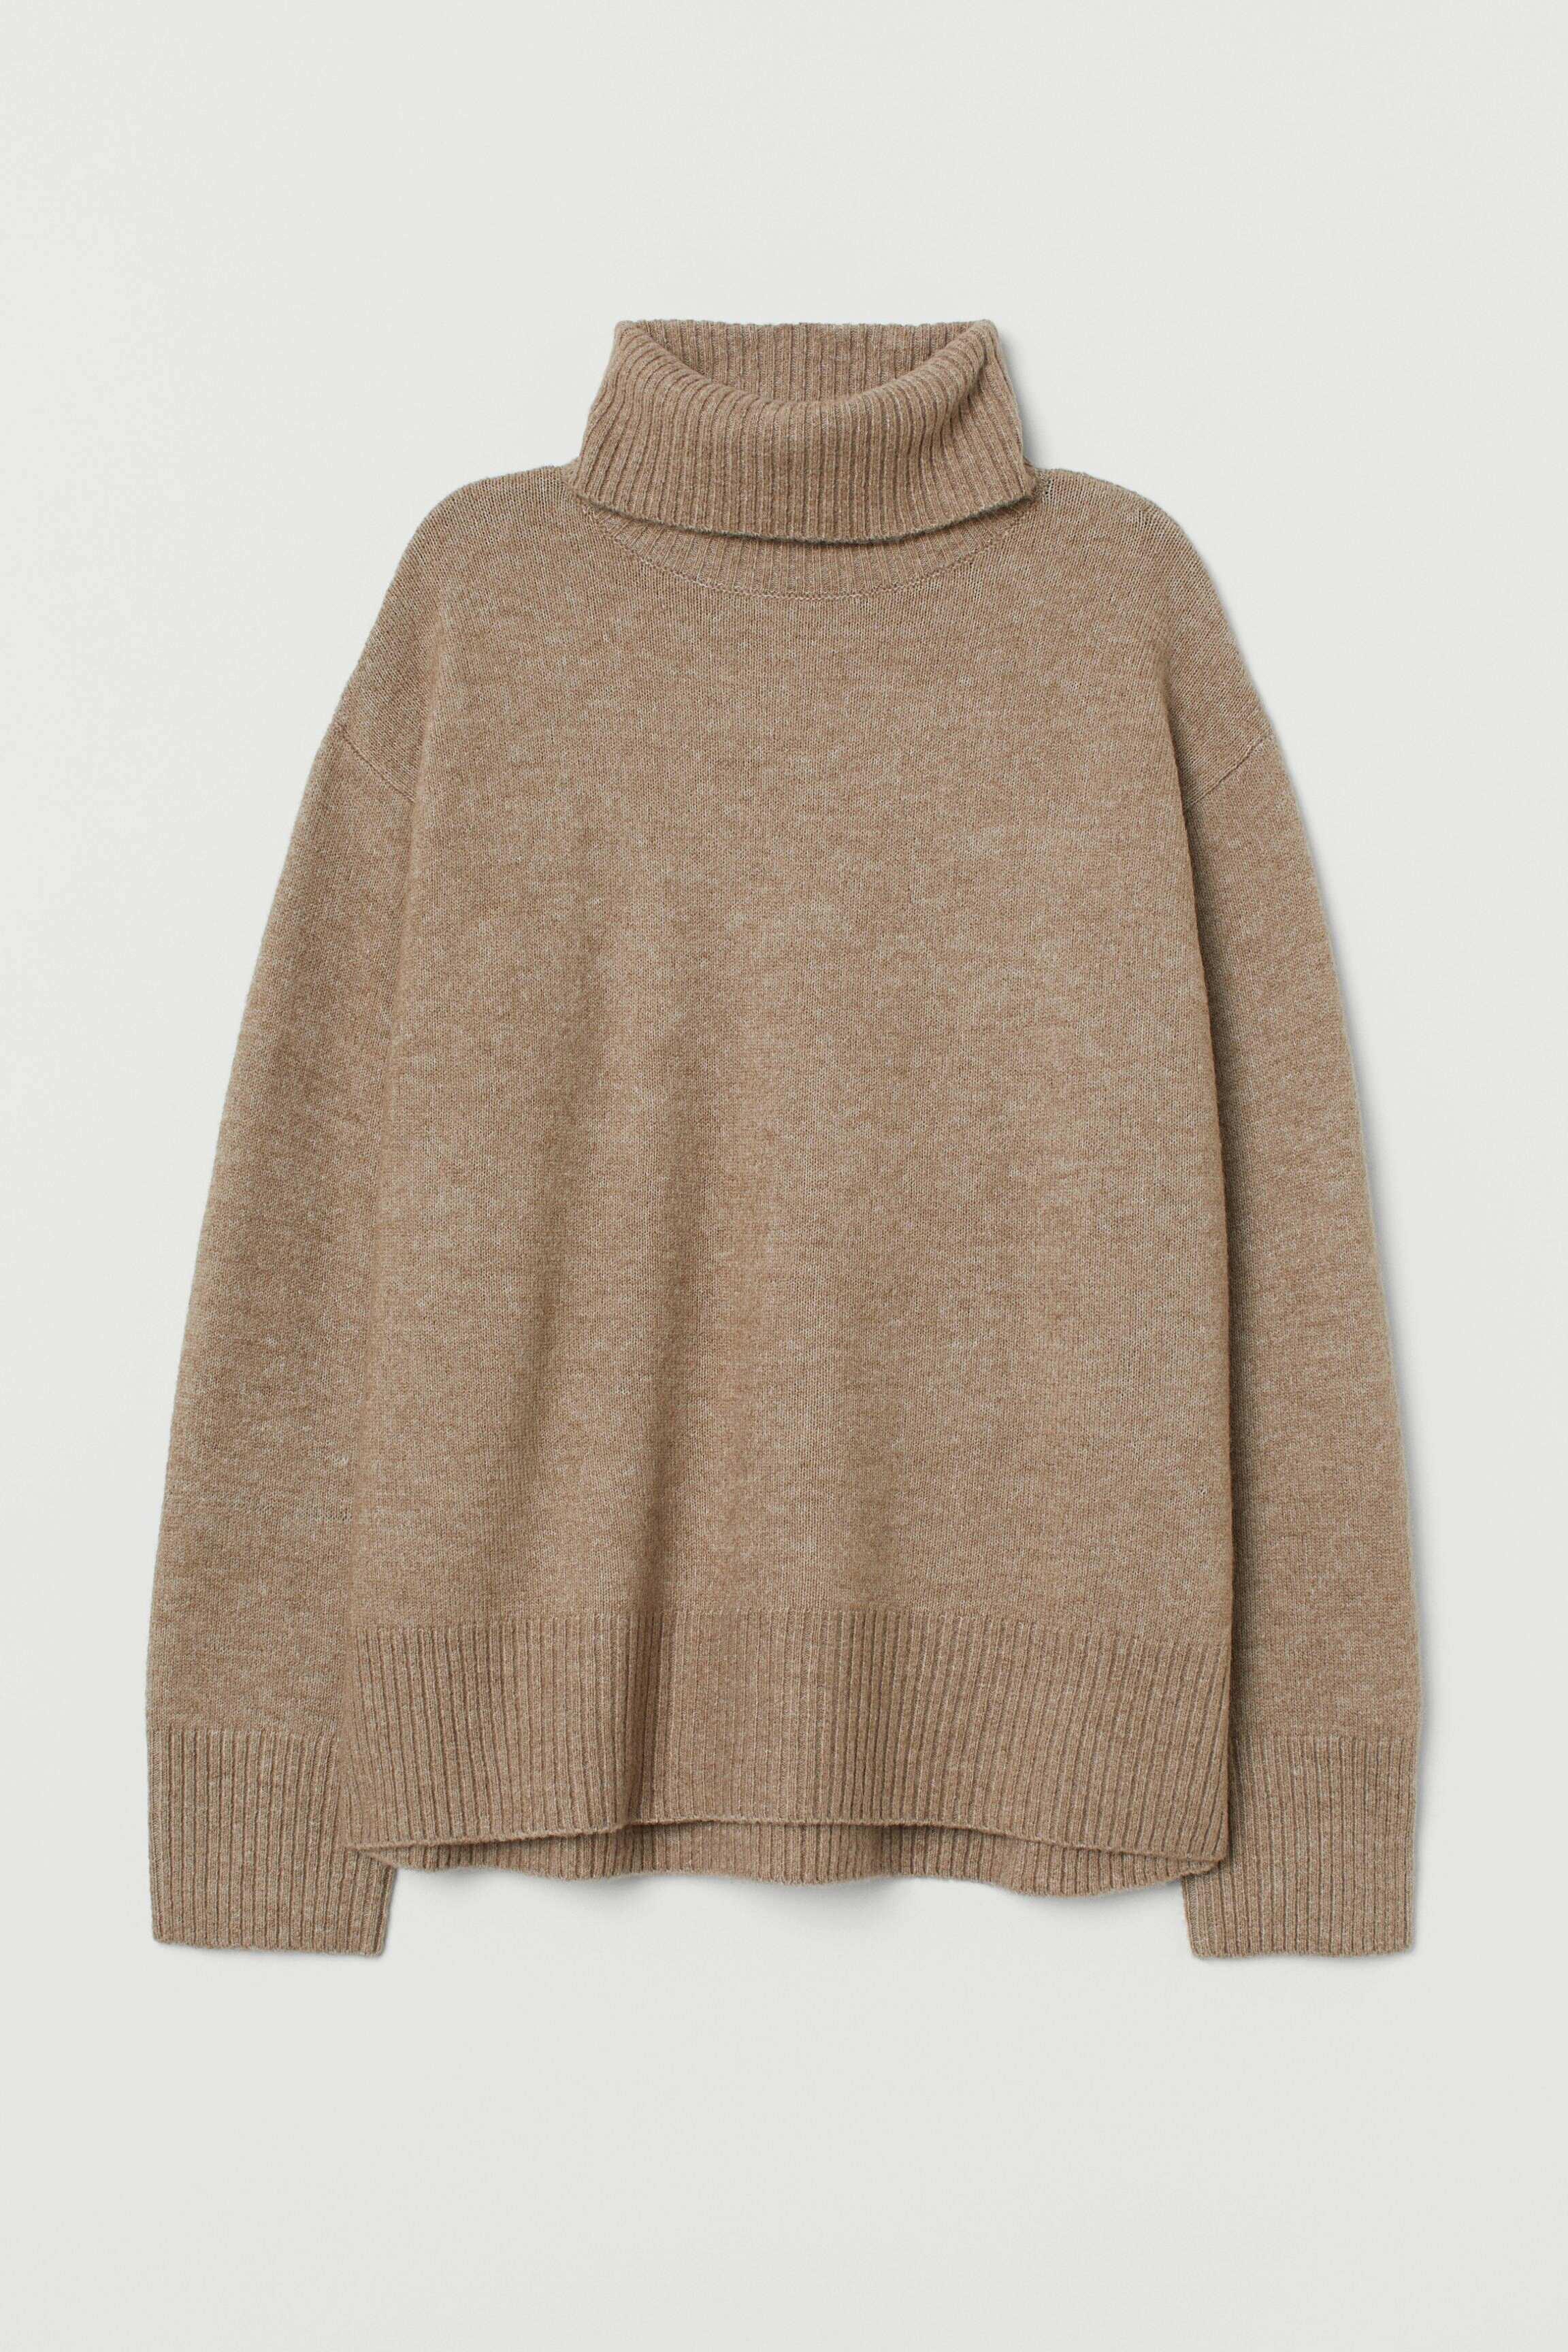 [Terminé]Shopping à l'improviste [PV Lizzy]  Hmgoep10